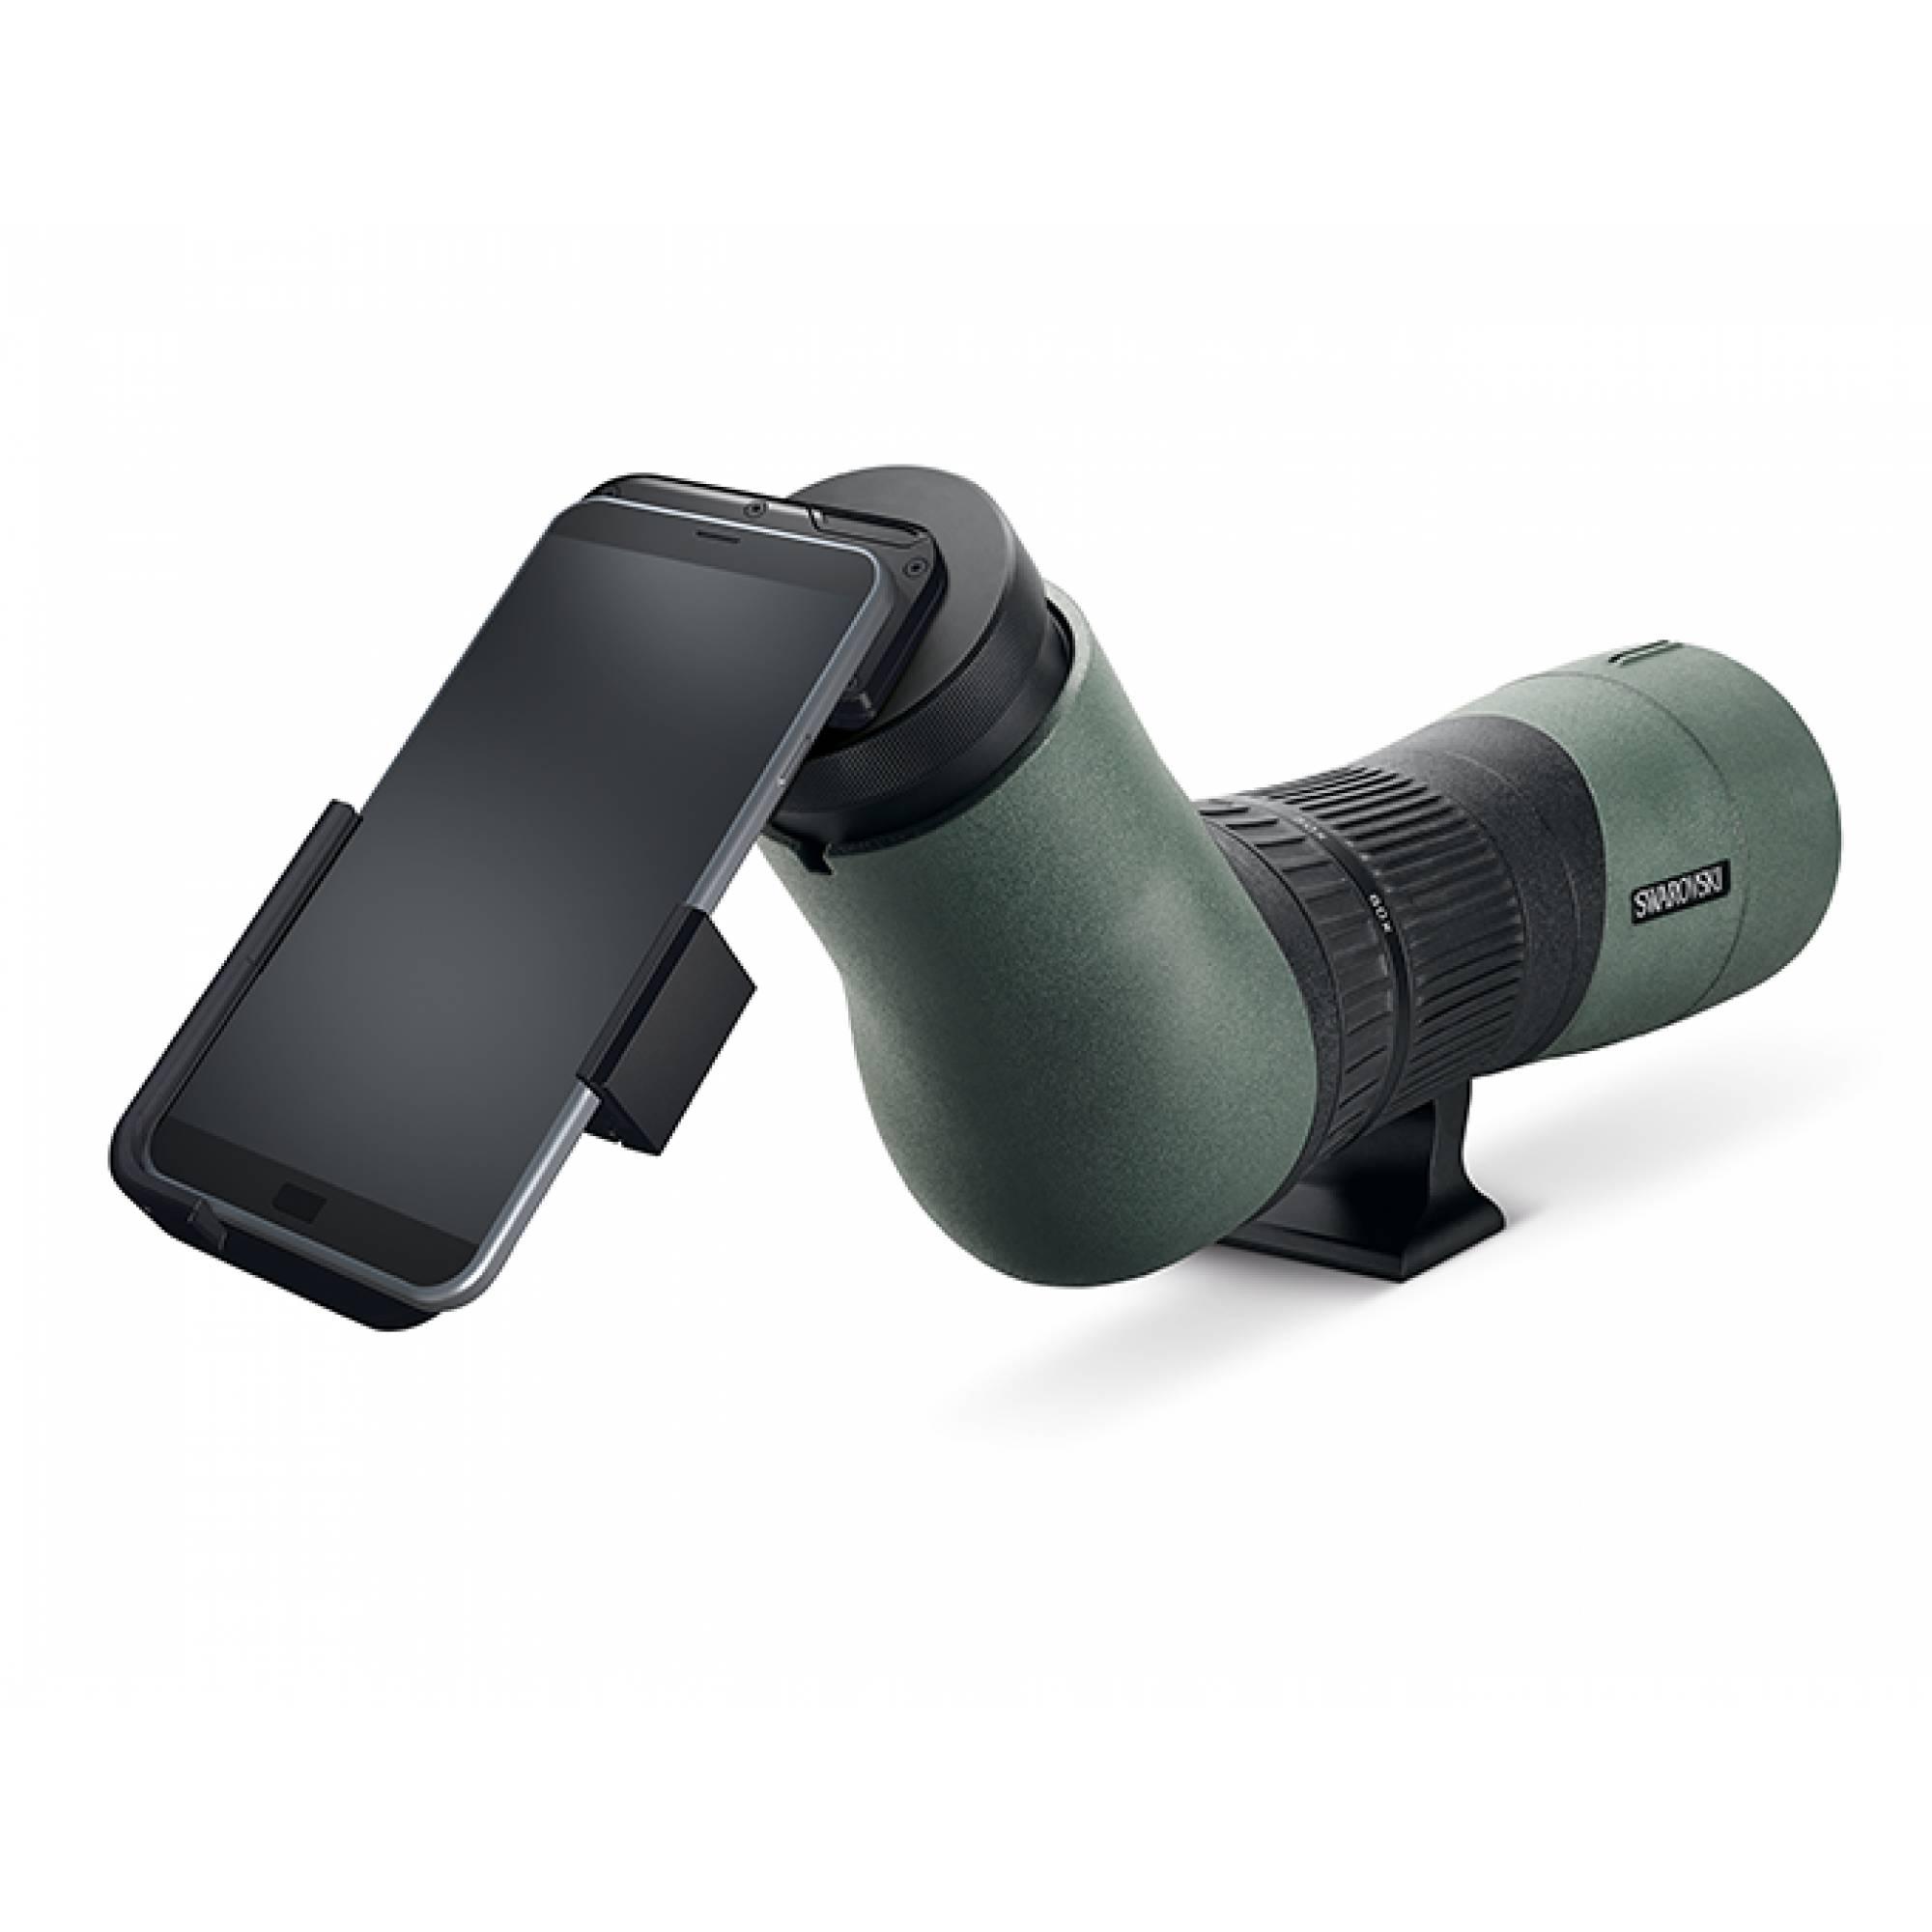 Swarovski Entfernungsmesser Kinder : Swarovski vpa variabler phone adapter u ac